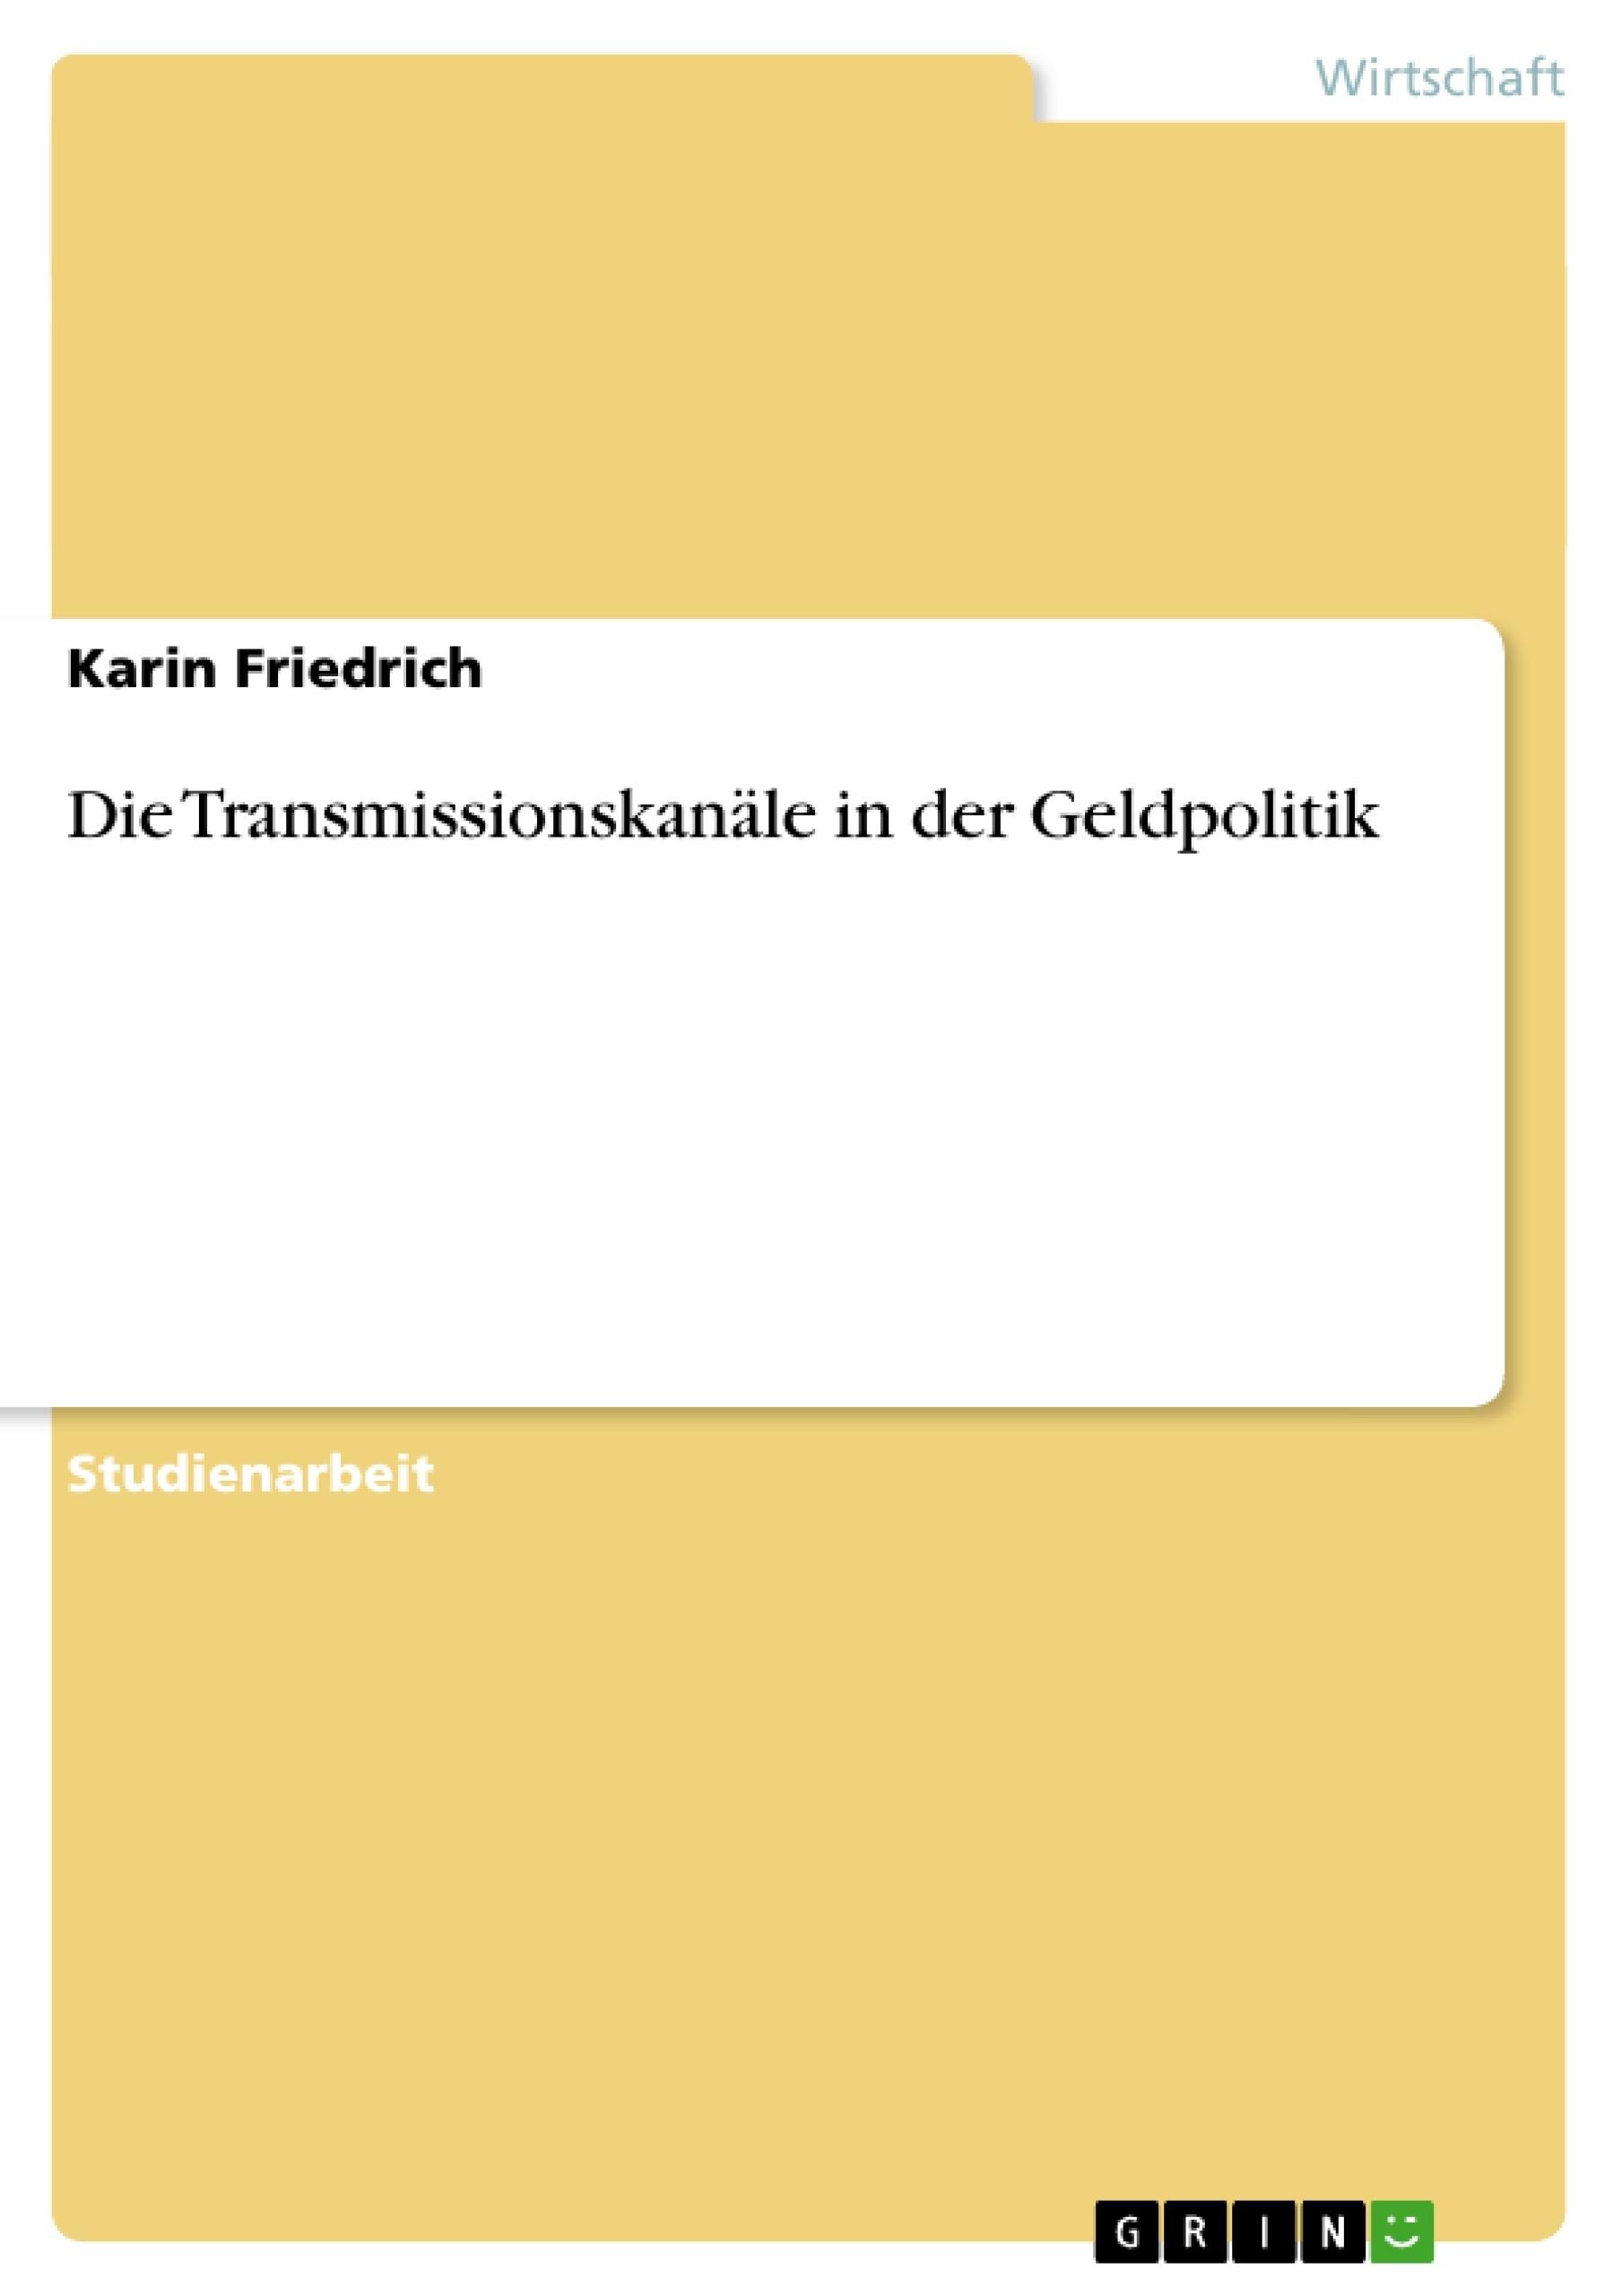 Titel: Die Transmissionskanäle in der Geldpolitik